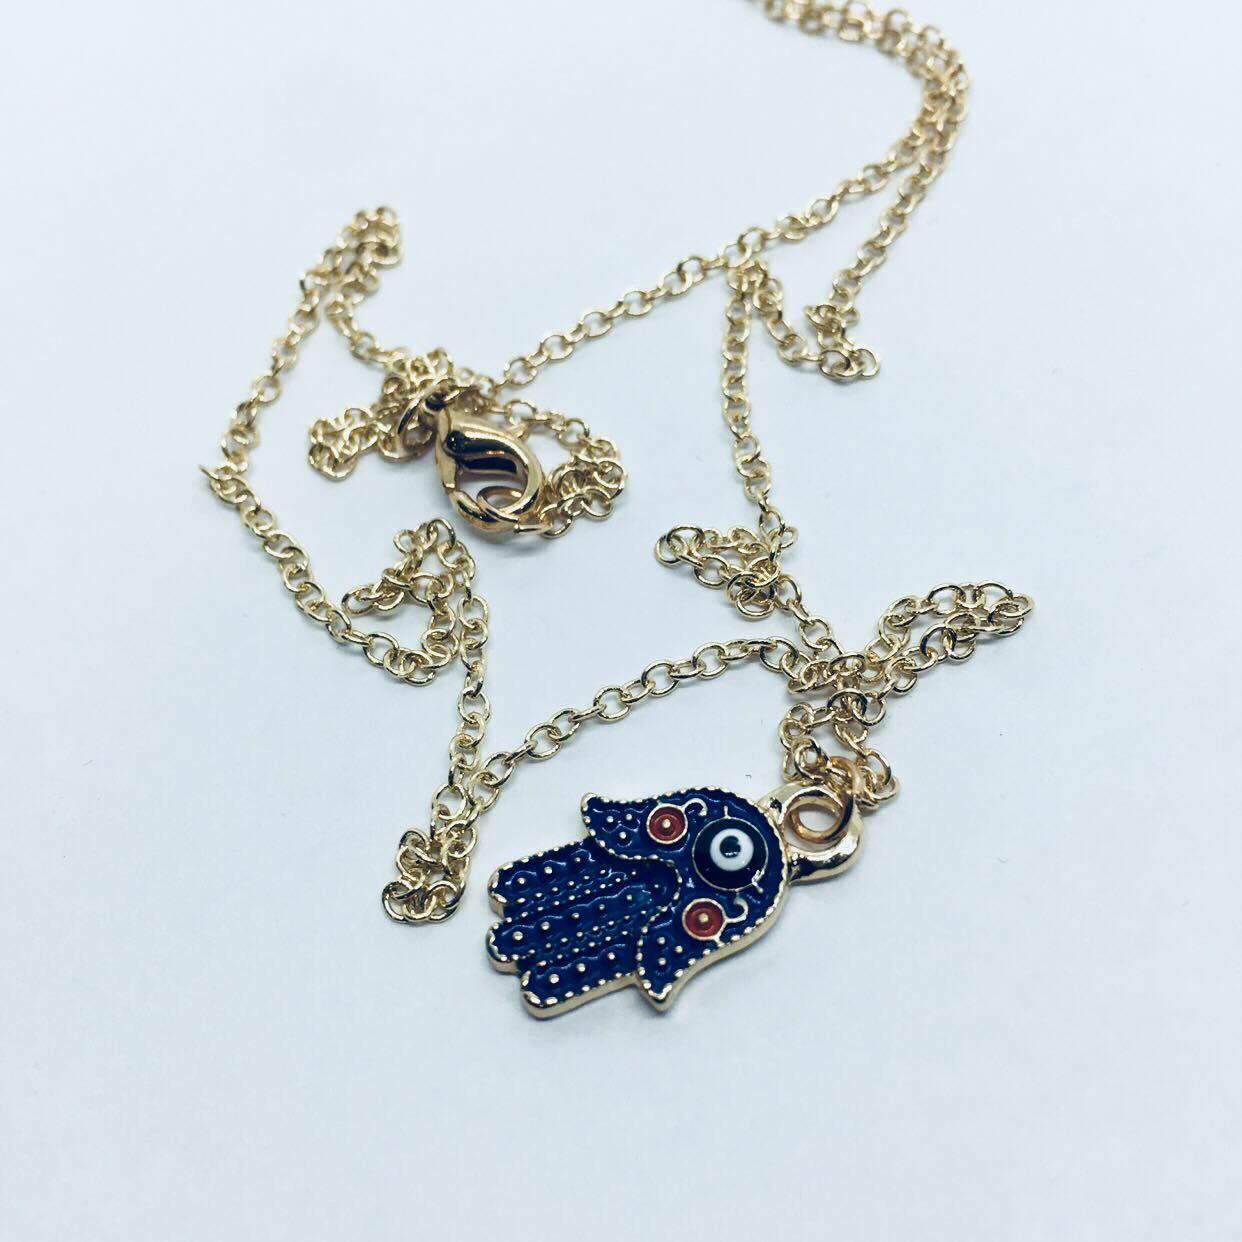 Small Hamsa Hand Necklace gold tone